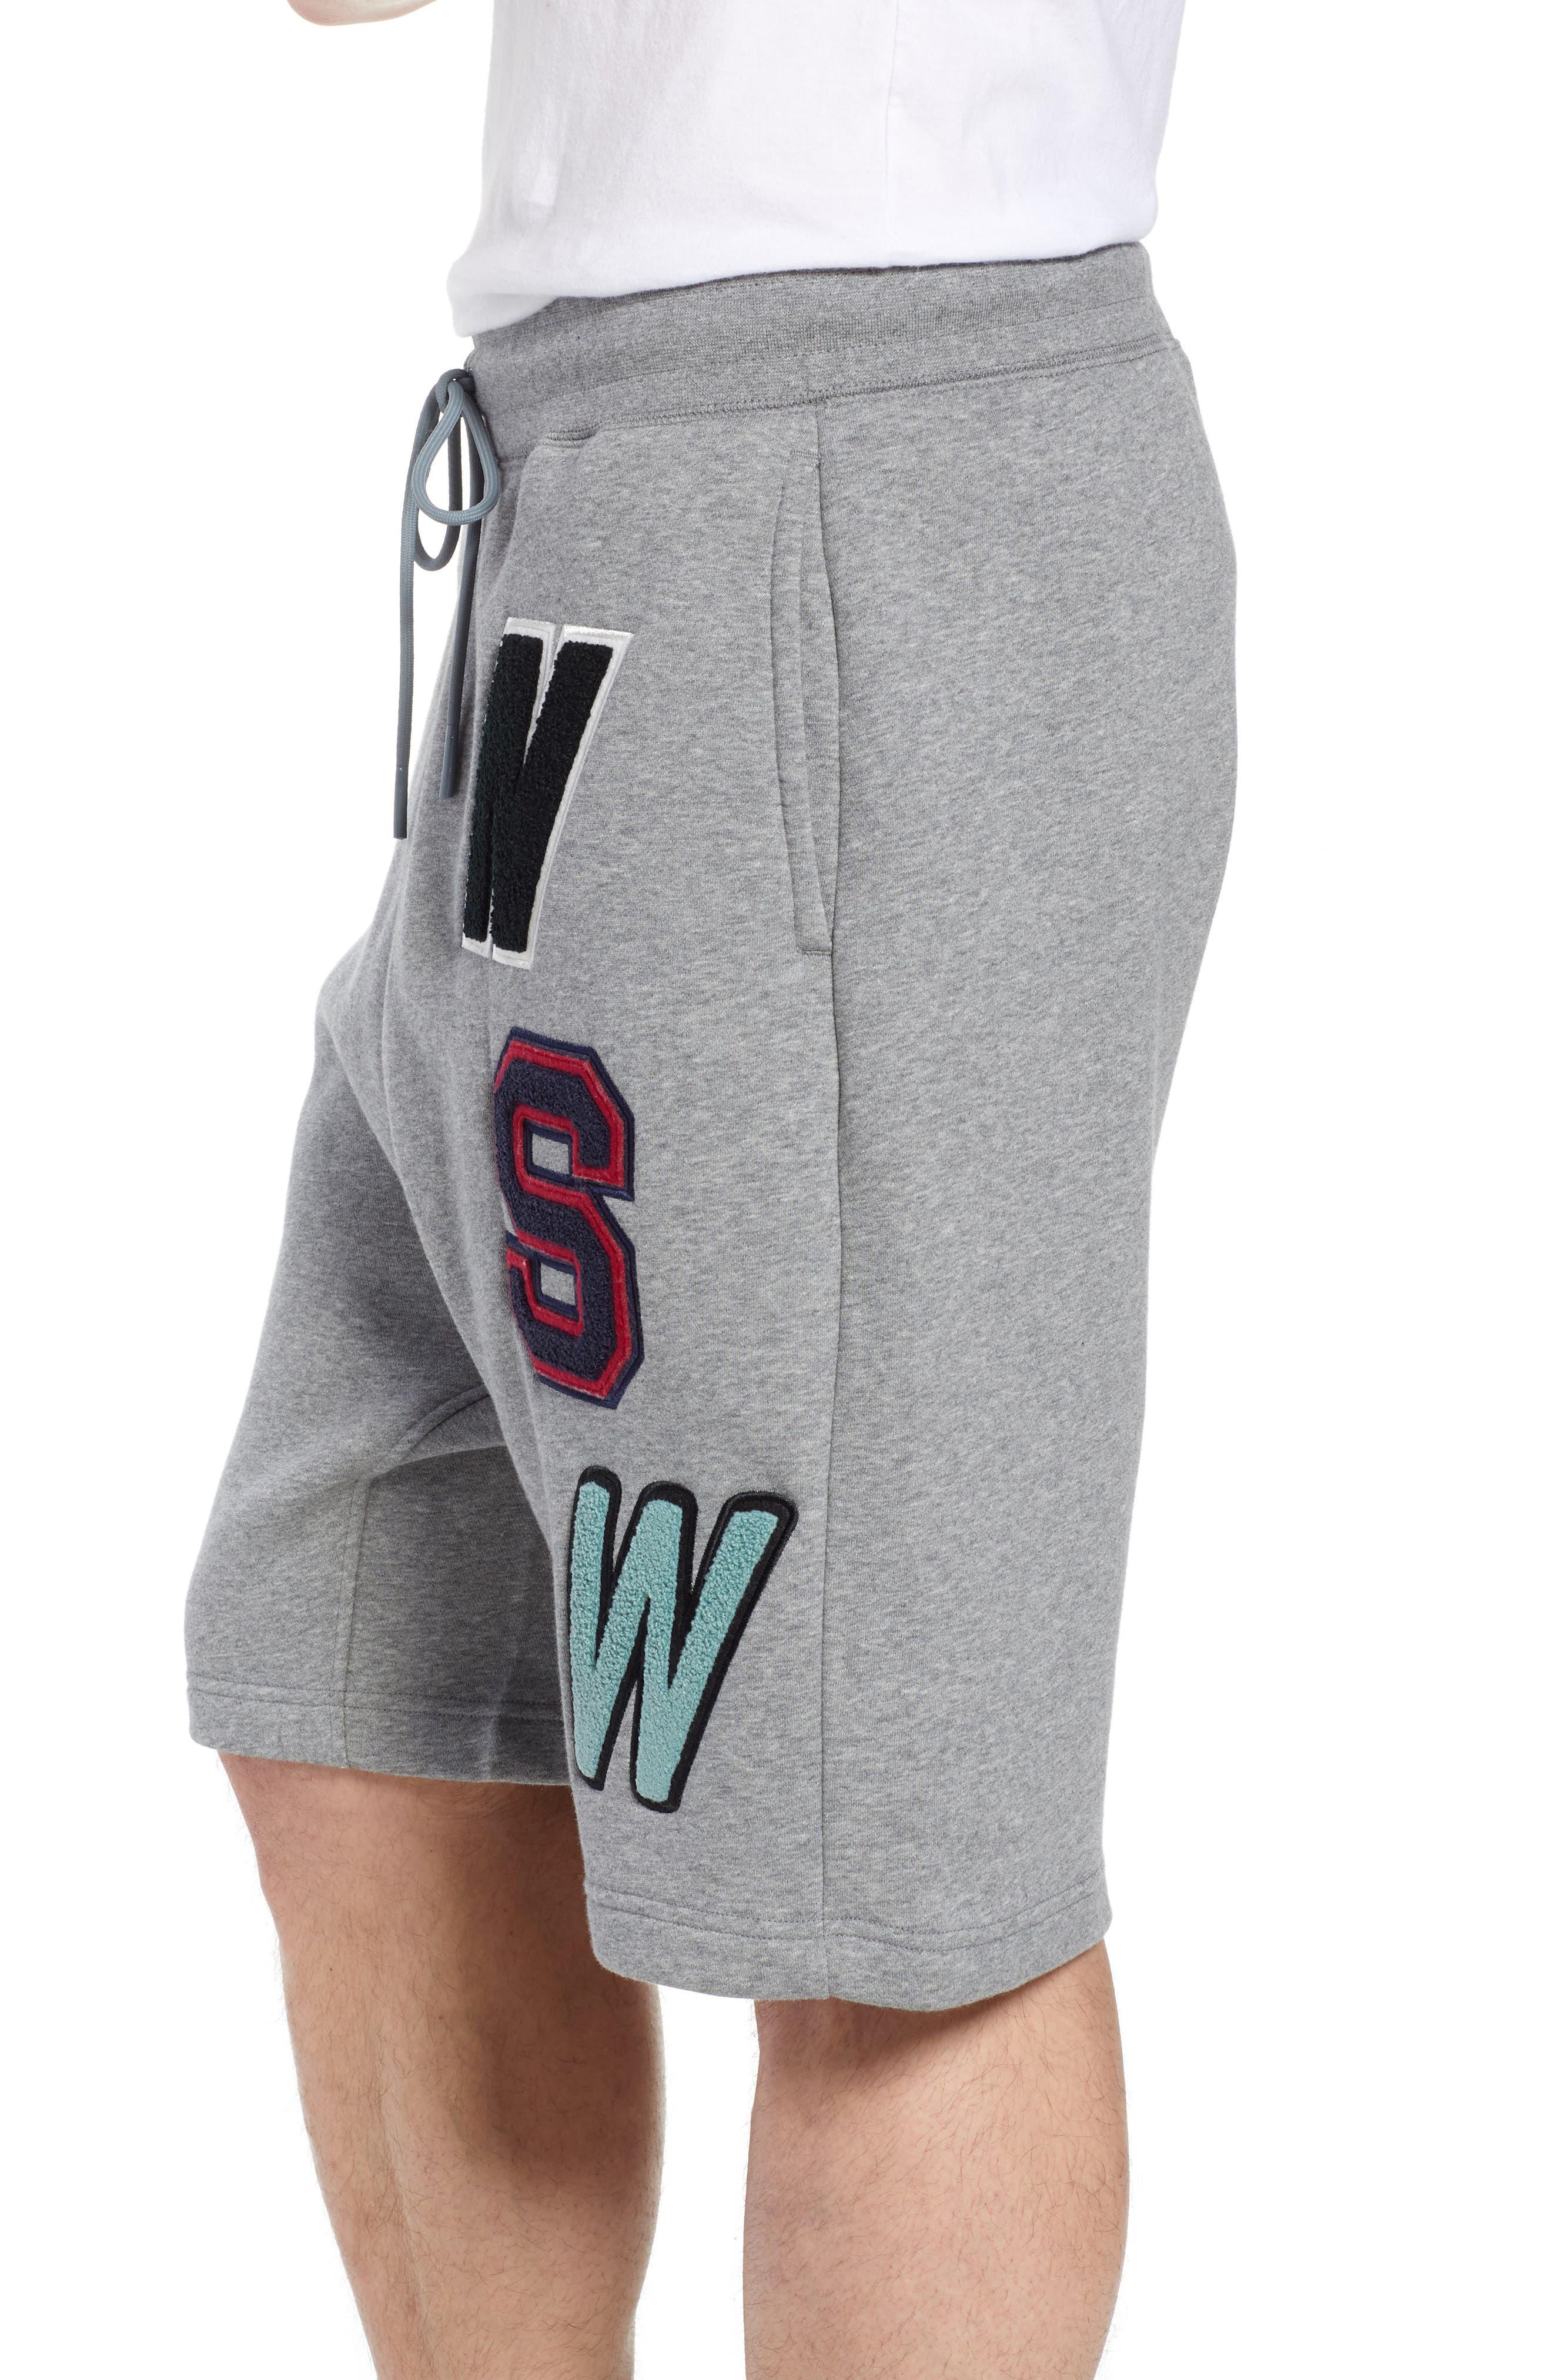 NSW Fleece Shorts,                             Alternate thumbnail 3, color,                             091